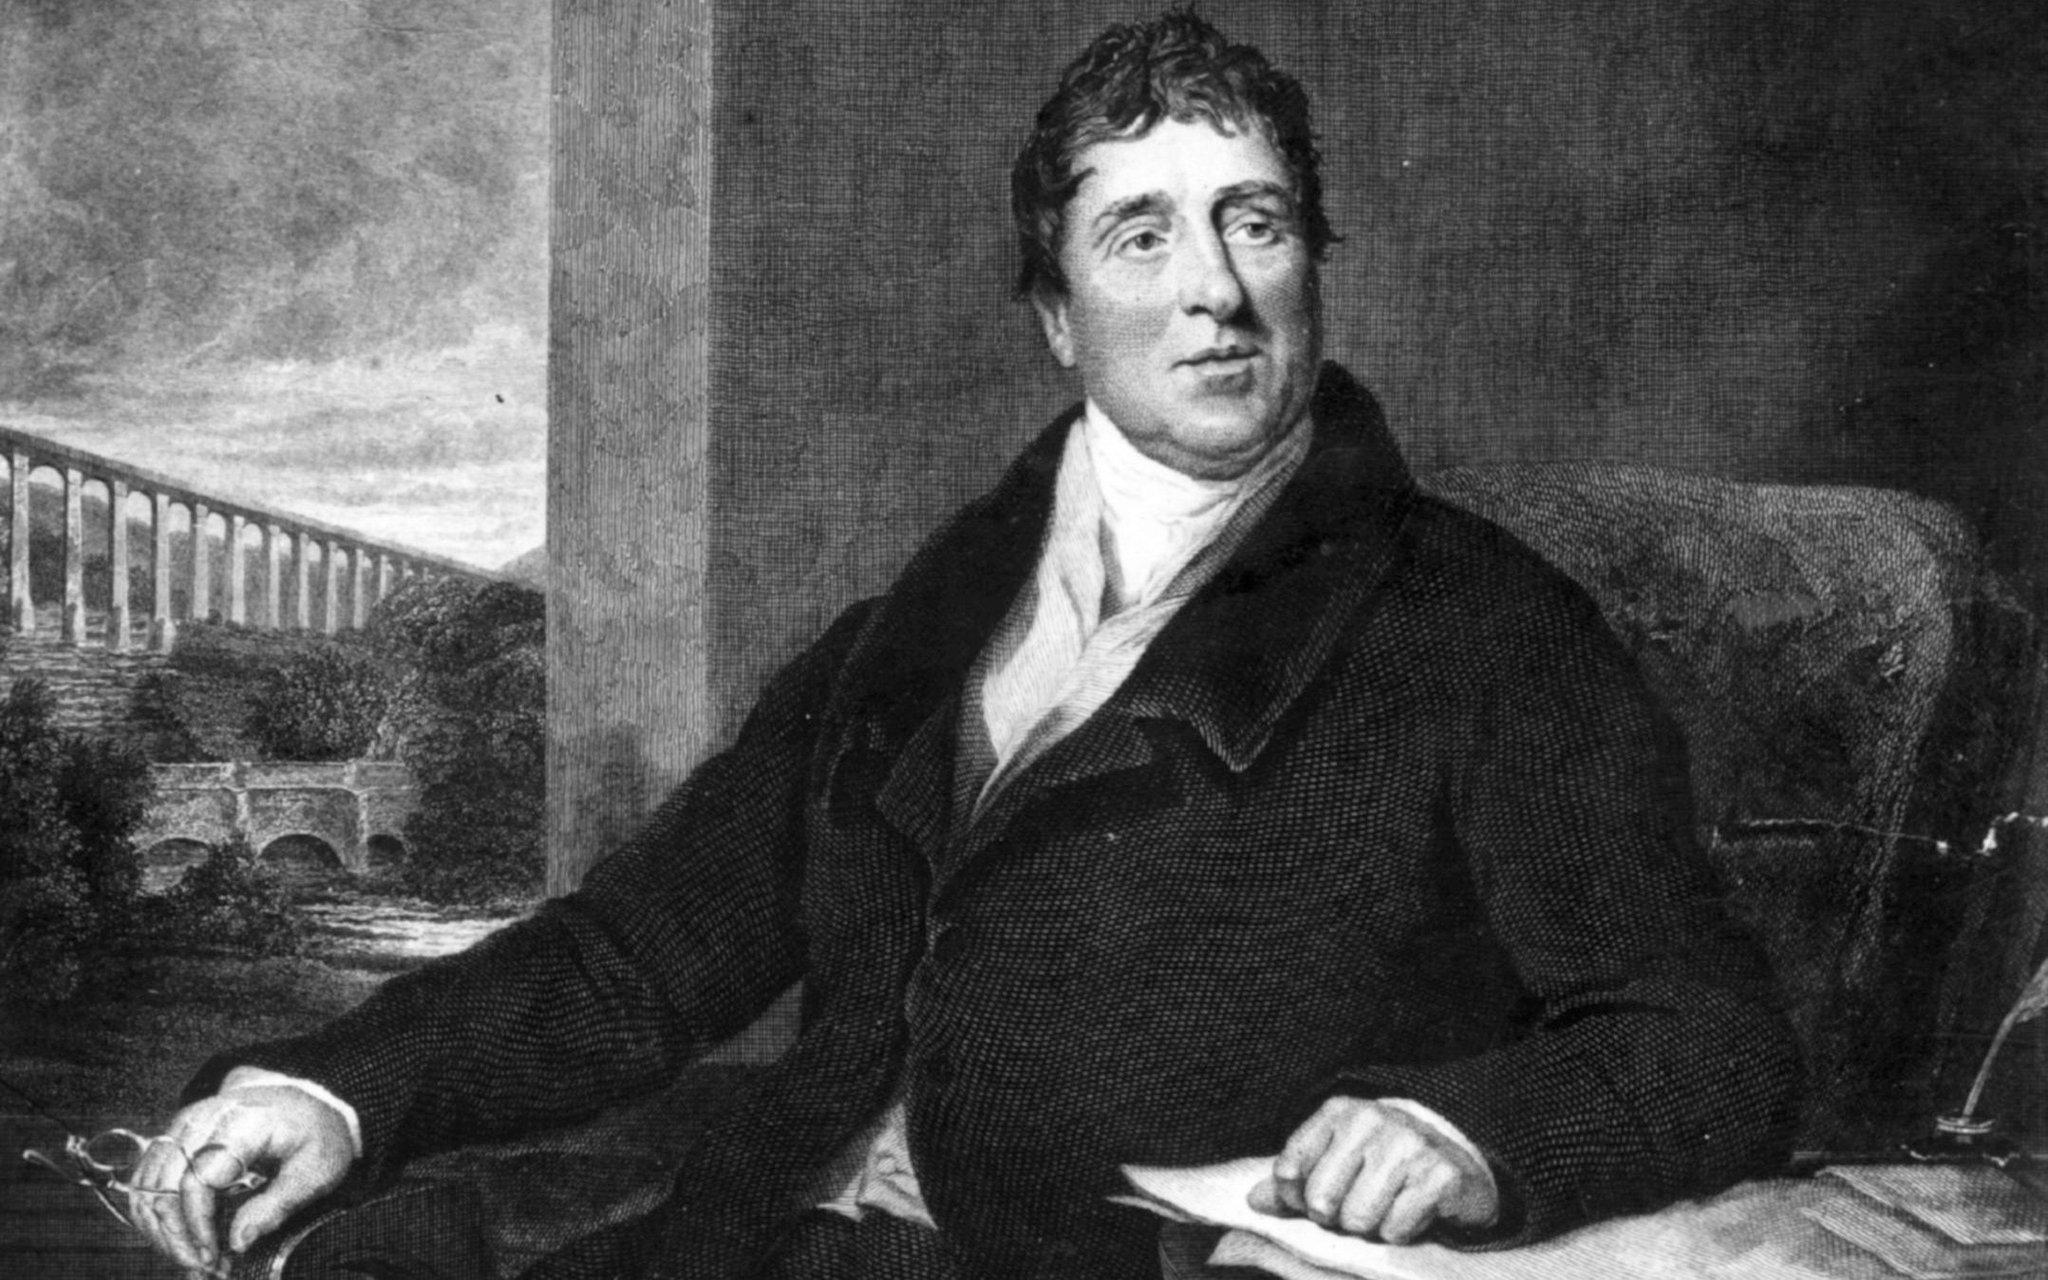 09AUG1757: Birth of #ThomasTelford, Scottish #CivilEngineer, architect & stonemason; prolific designer of early #19thCentury #infrastructure https://t.co/X98GeqSr0N